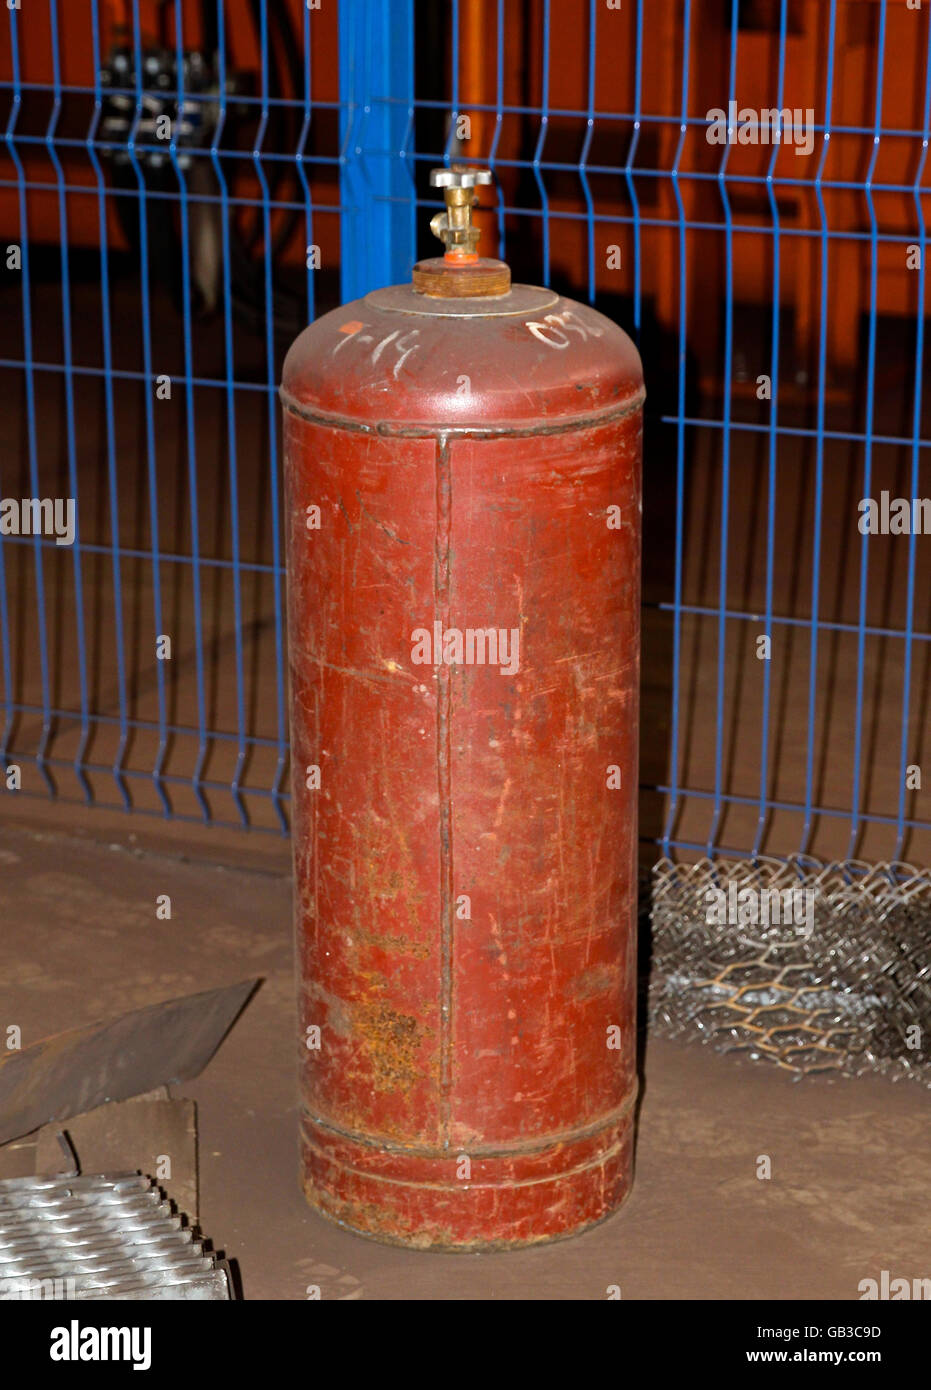 high pressure cylinder for compressed industrial gases - Stock Image